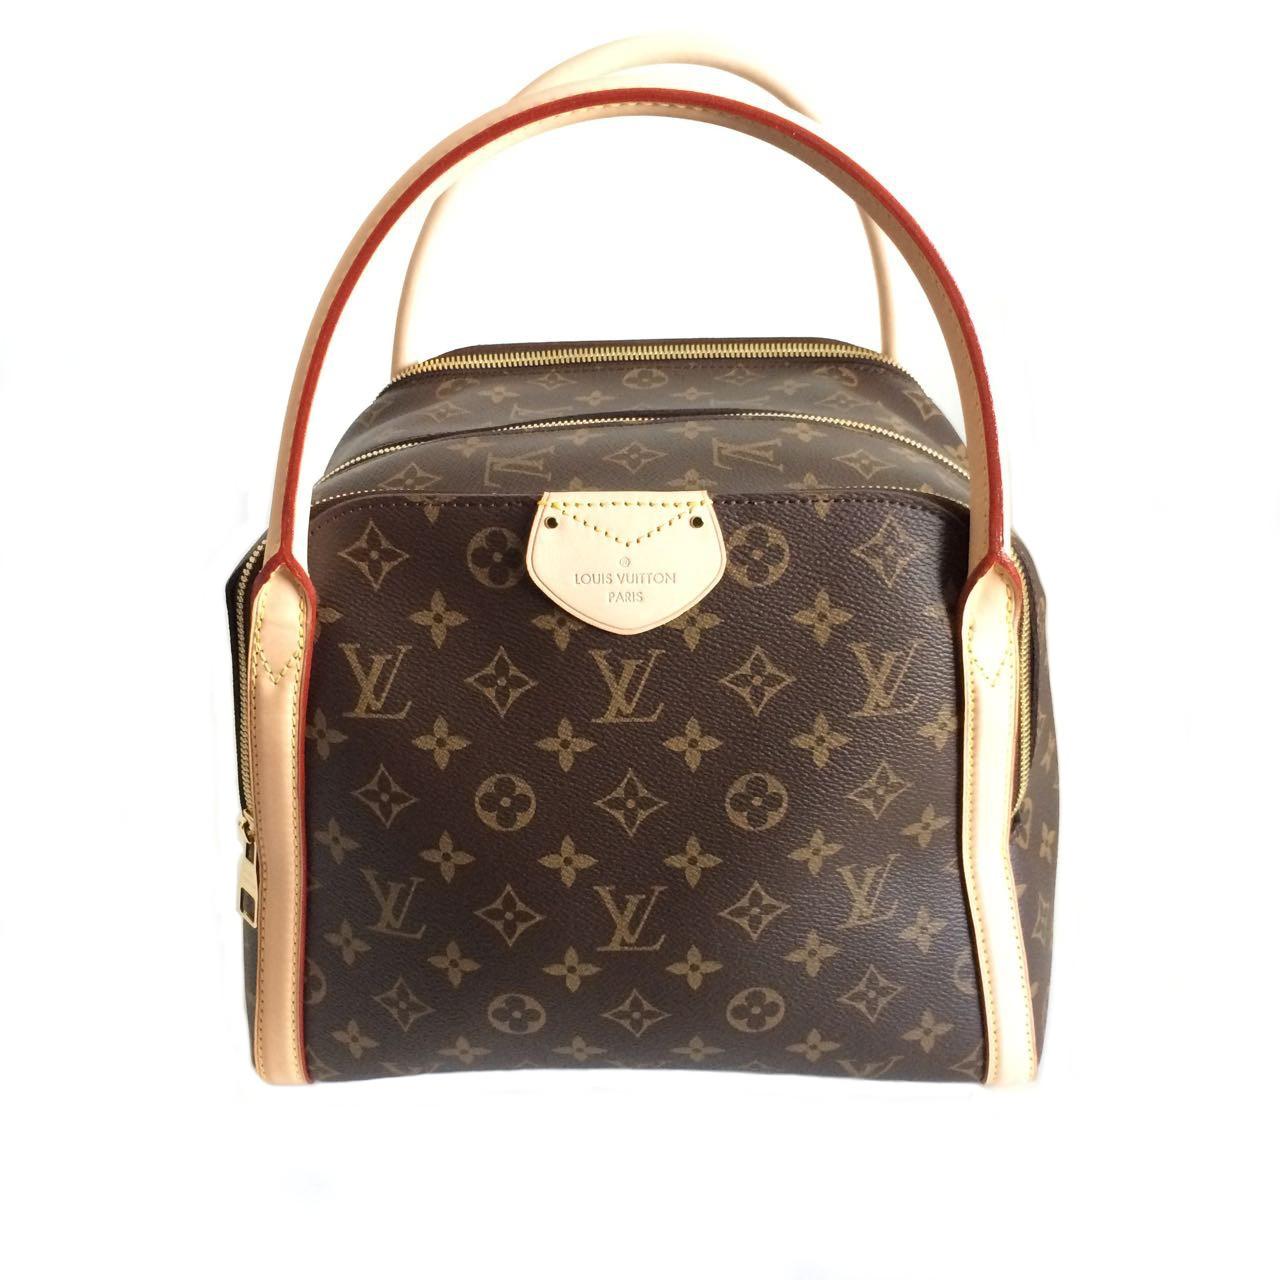 c9667a80d945 LOUIS VUITTON M41070 MARAIS MM CLASSIC MONOGRAM BOWLING HANDBAG - Handbags  - Shop